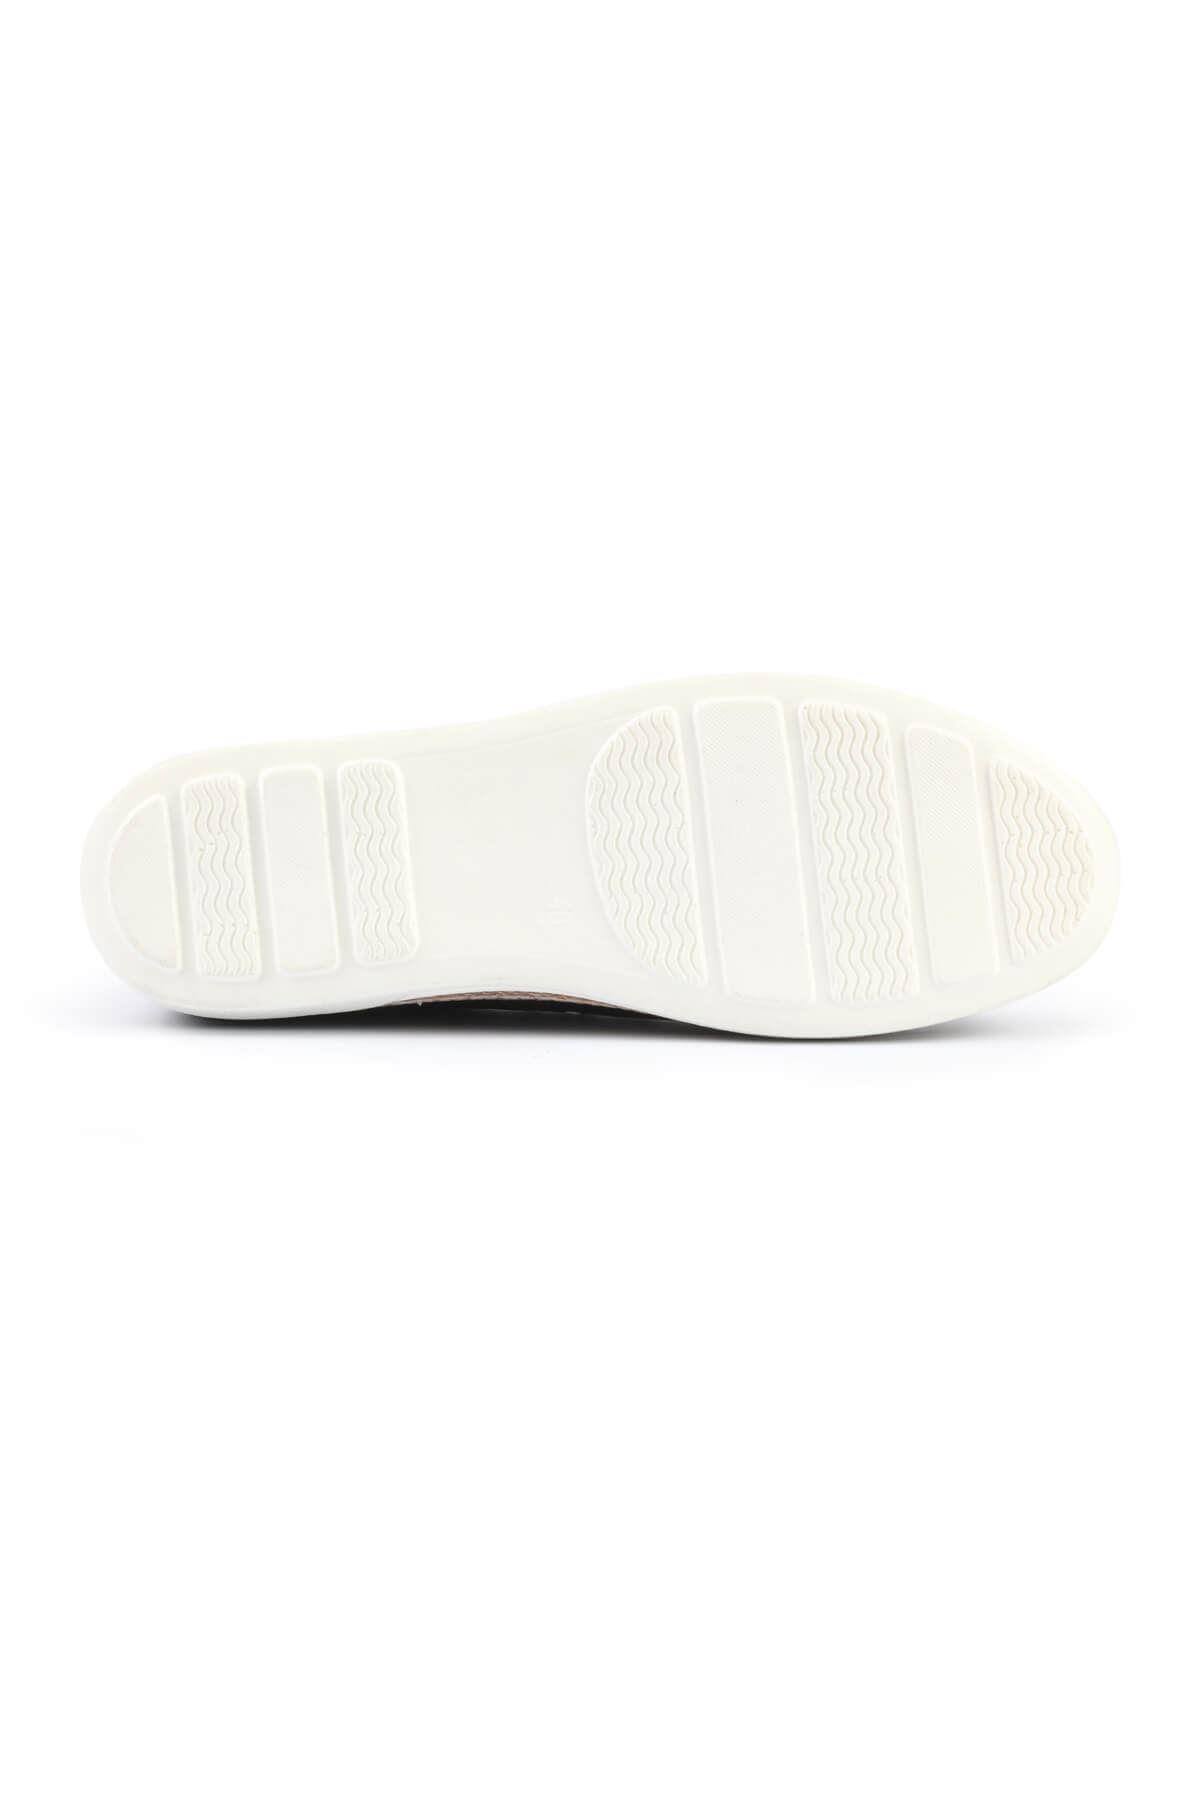 Libero C623 Mink Loafer Shoes